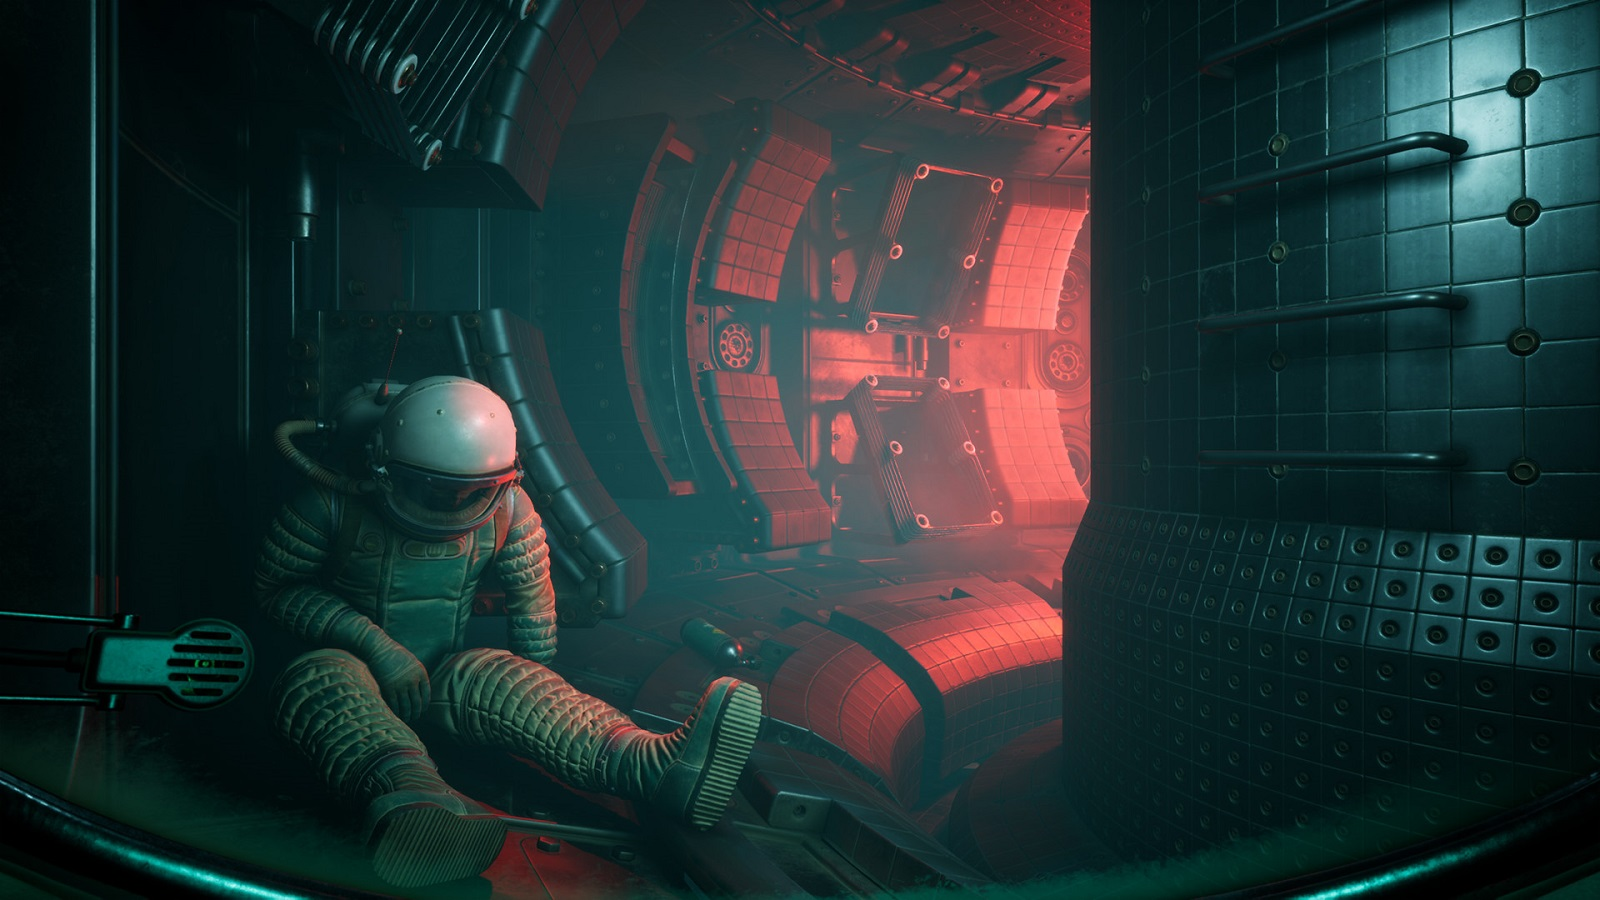 Бывшие сотрудники CD Projekt RED и Techland анонсировали приключение The Invincible по роману Станислава Лема - 04